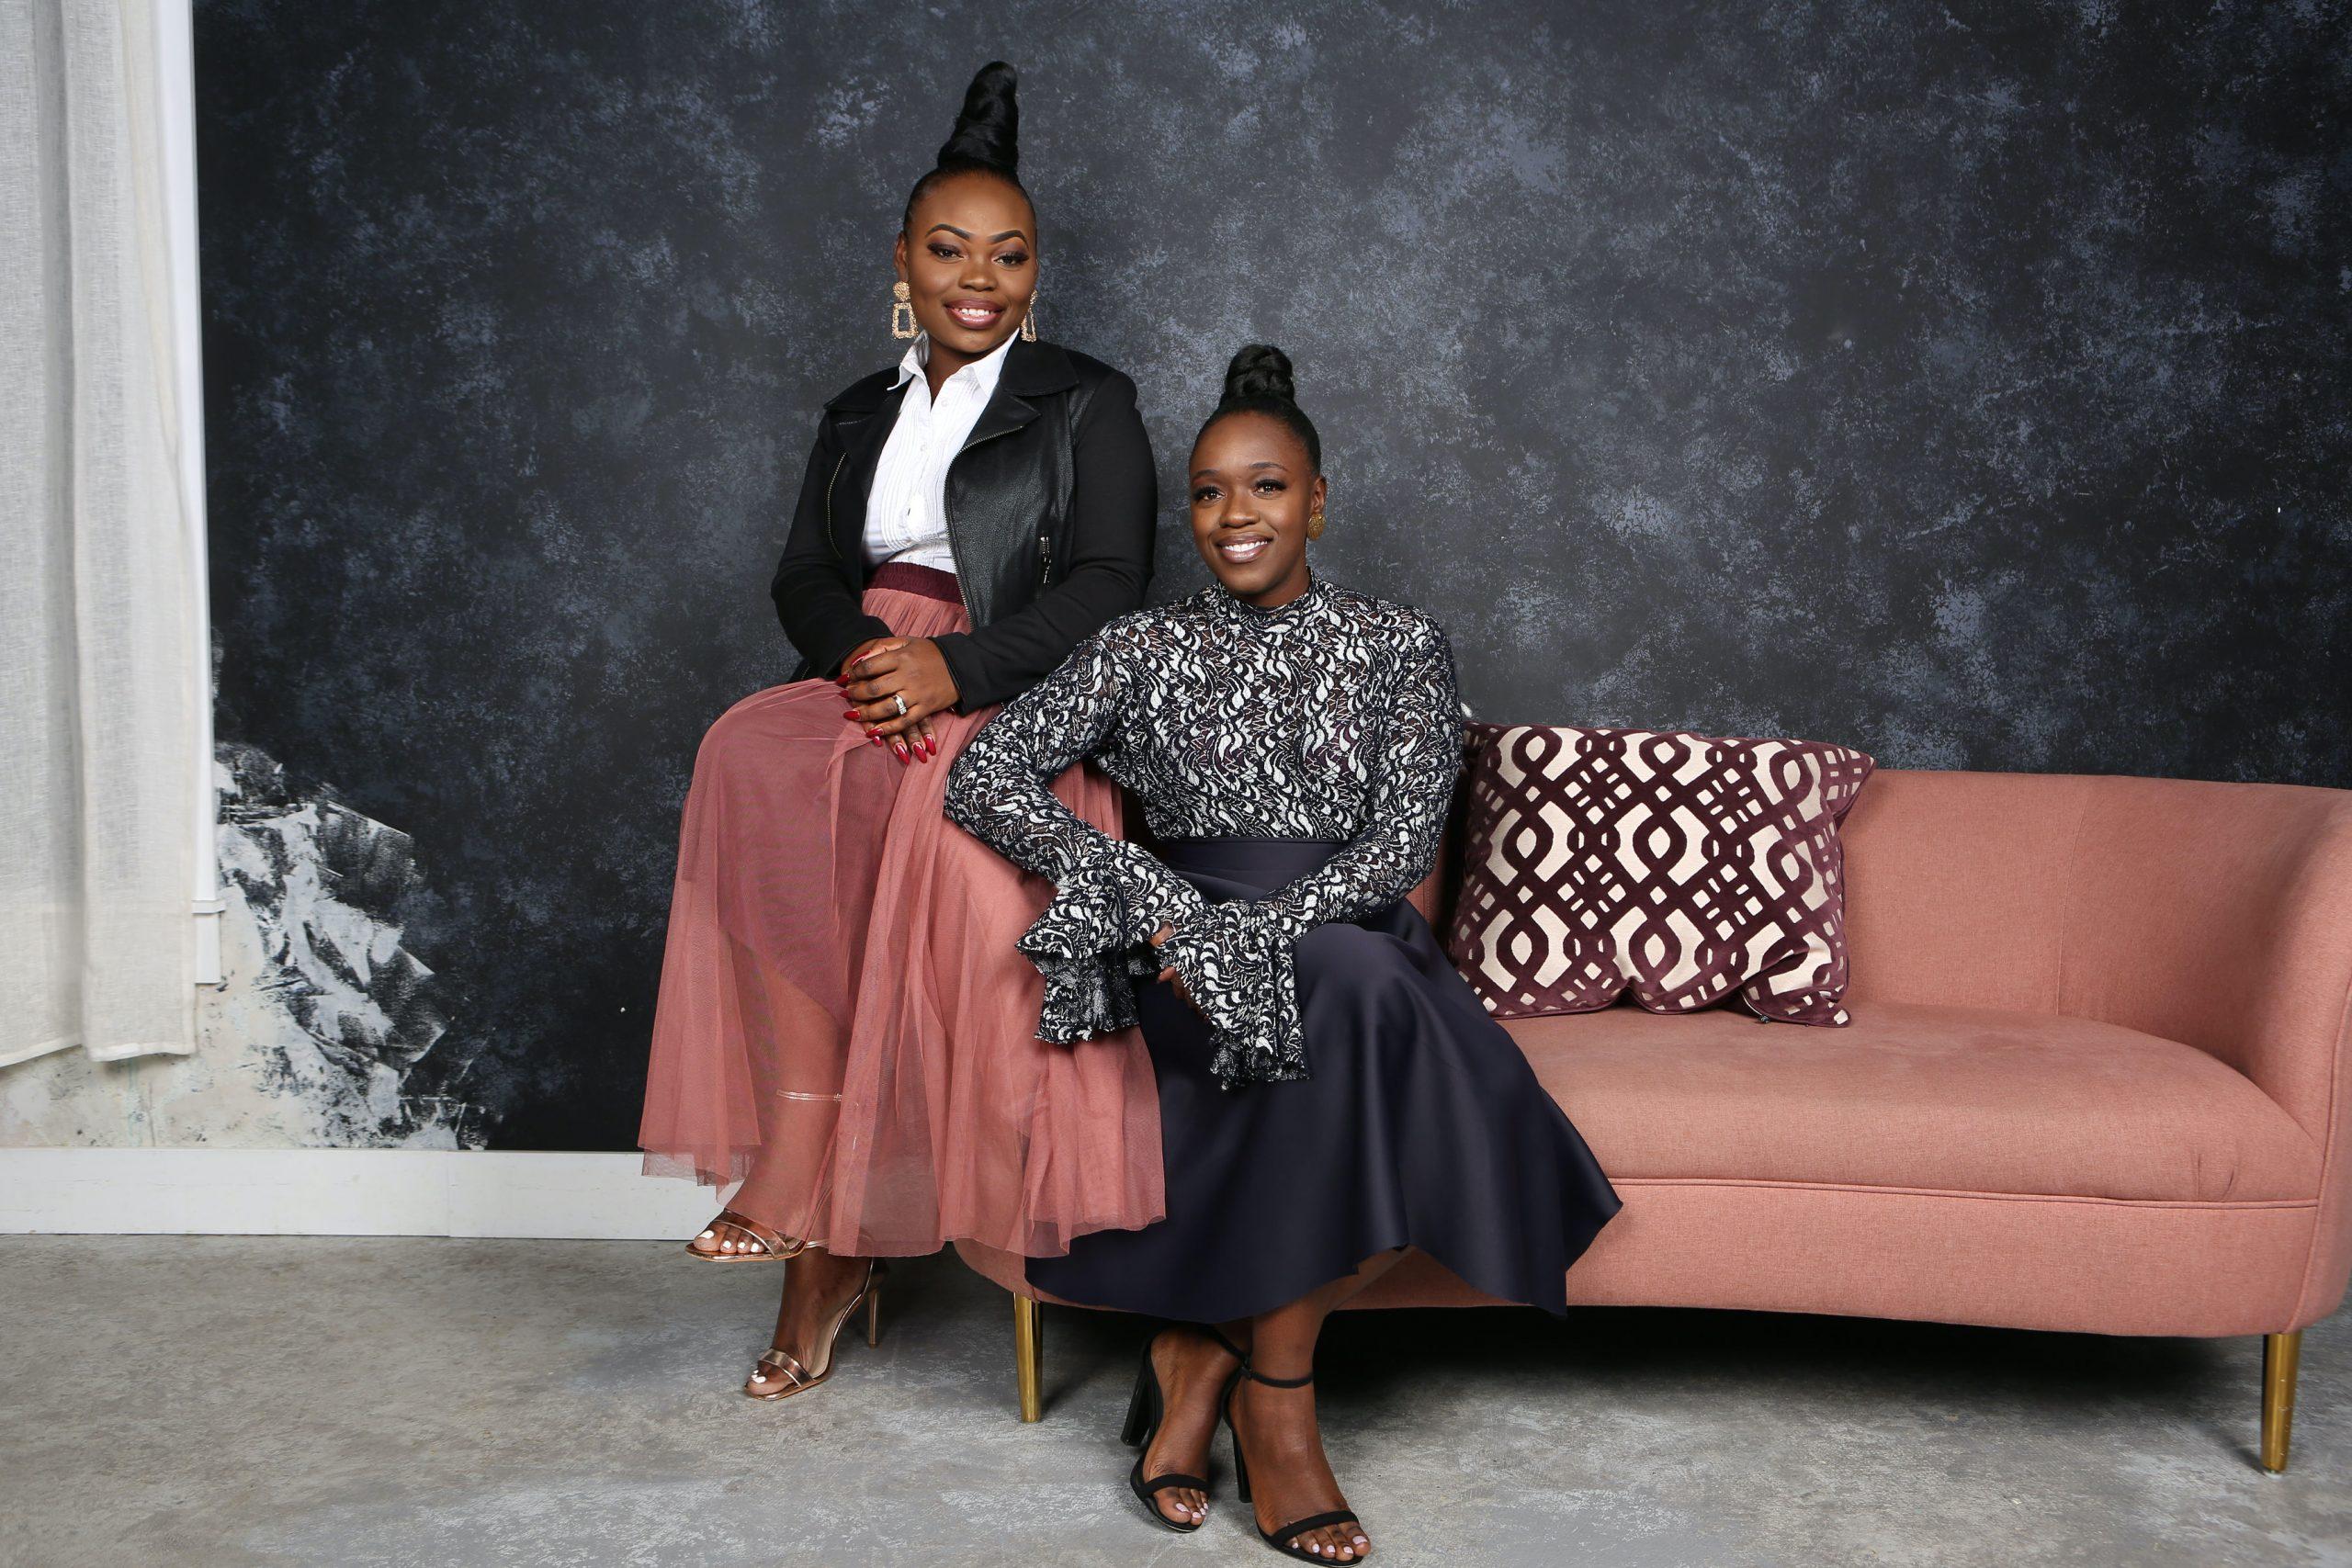 Femmebnb Inc. Co-Founders, Yaa Birago and Diana Obeng